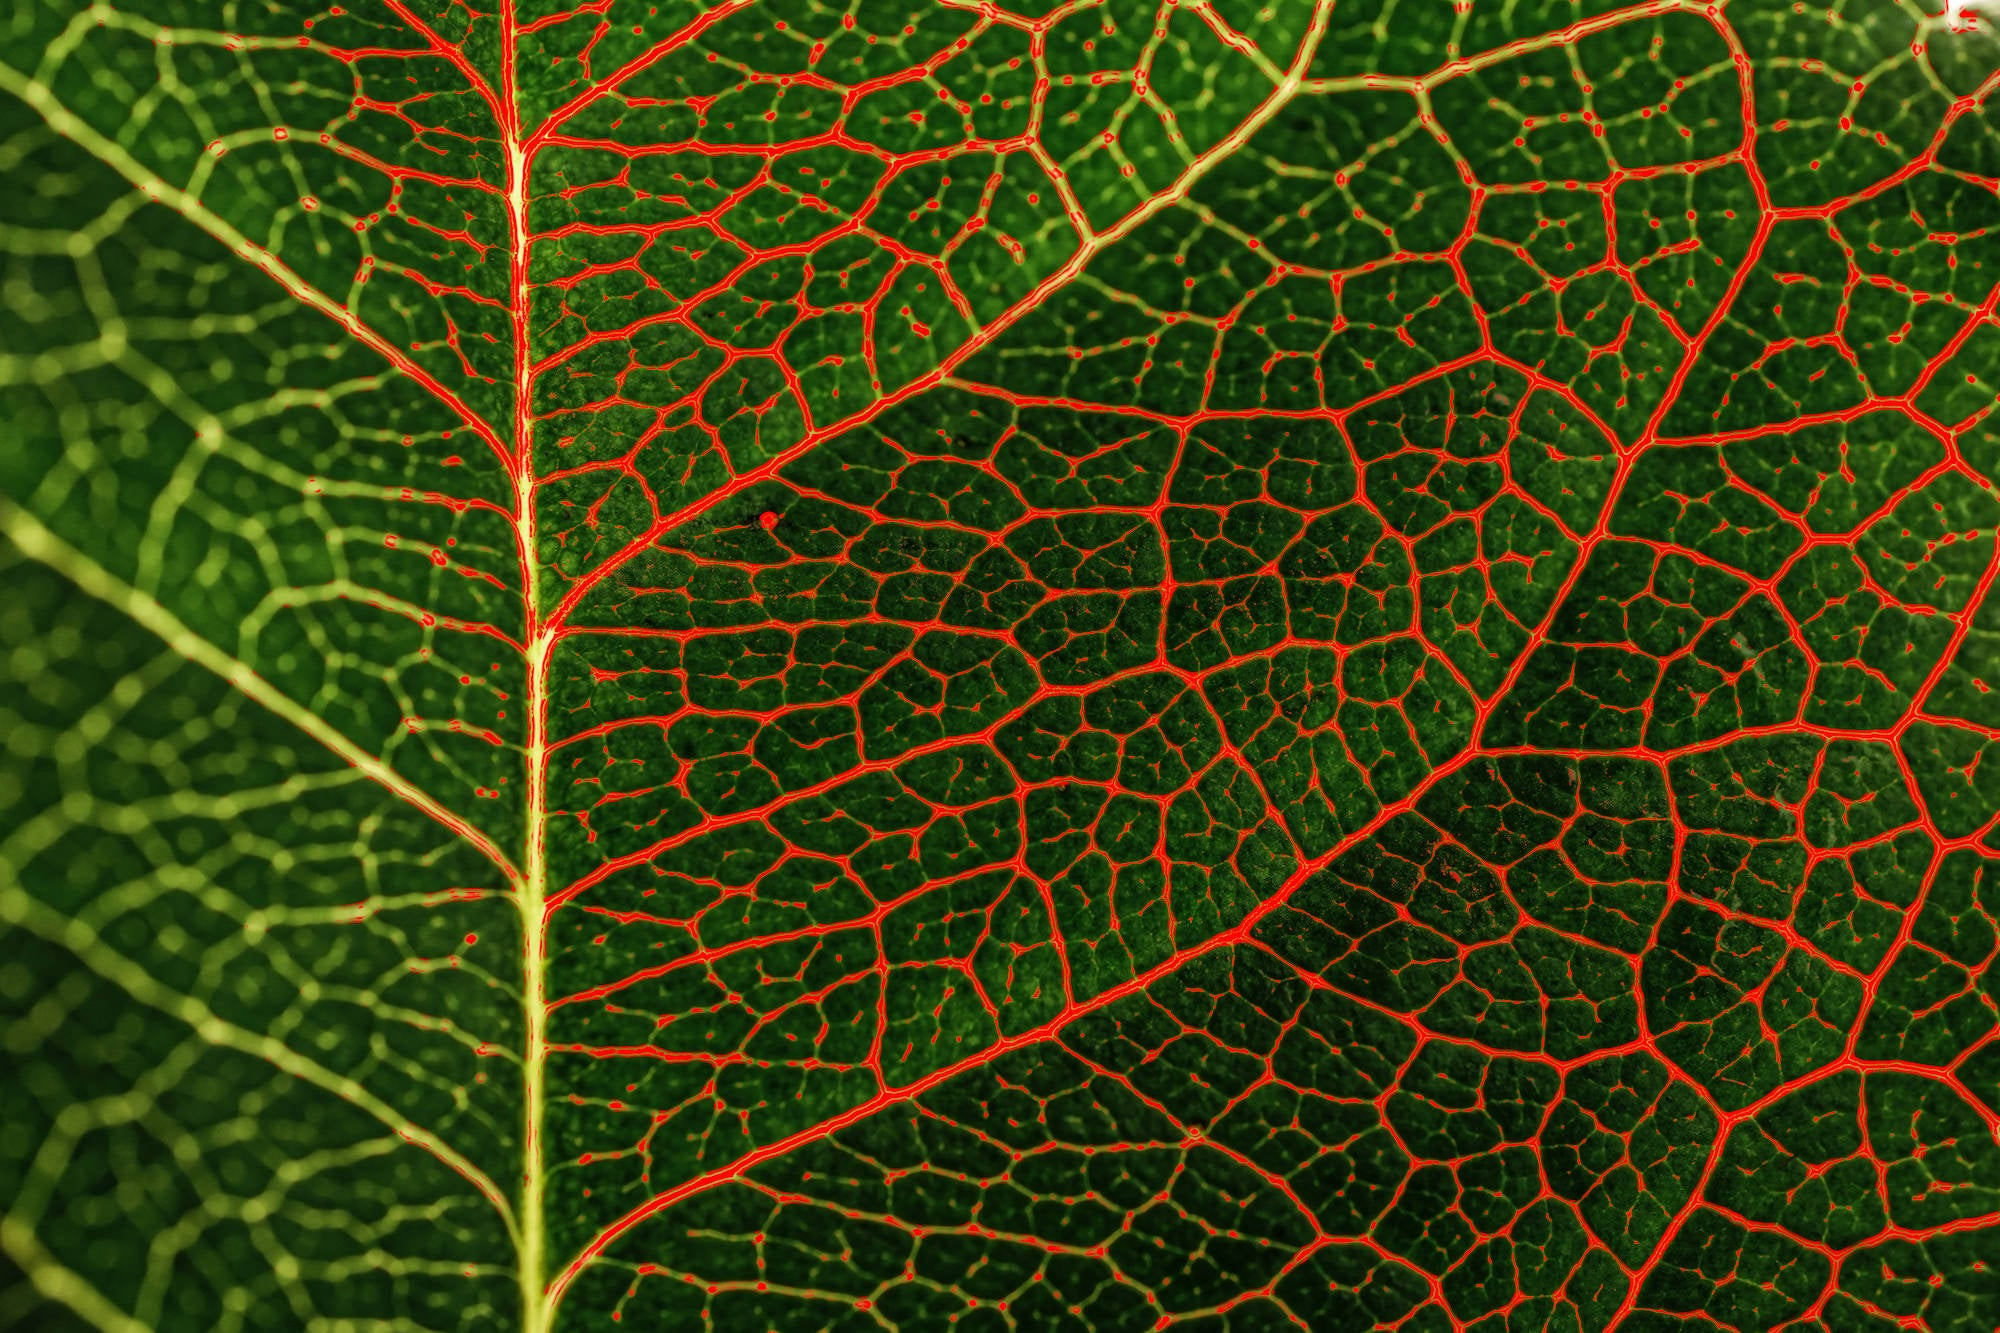 Alpha-Universe-Caroline-Jensen-Macro-focus-peaking-leaf.jpg